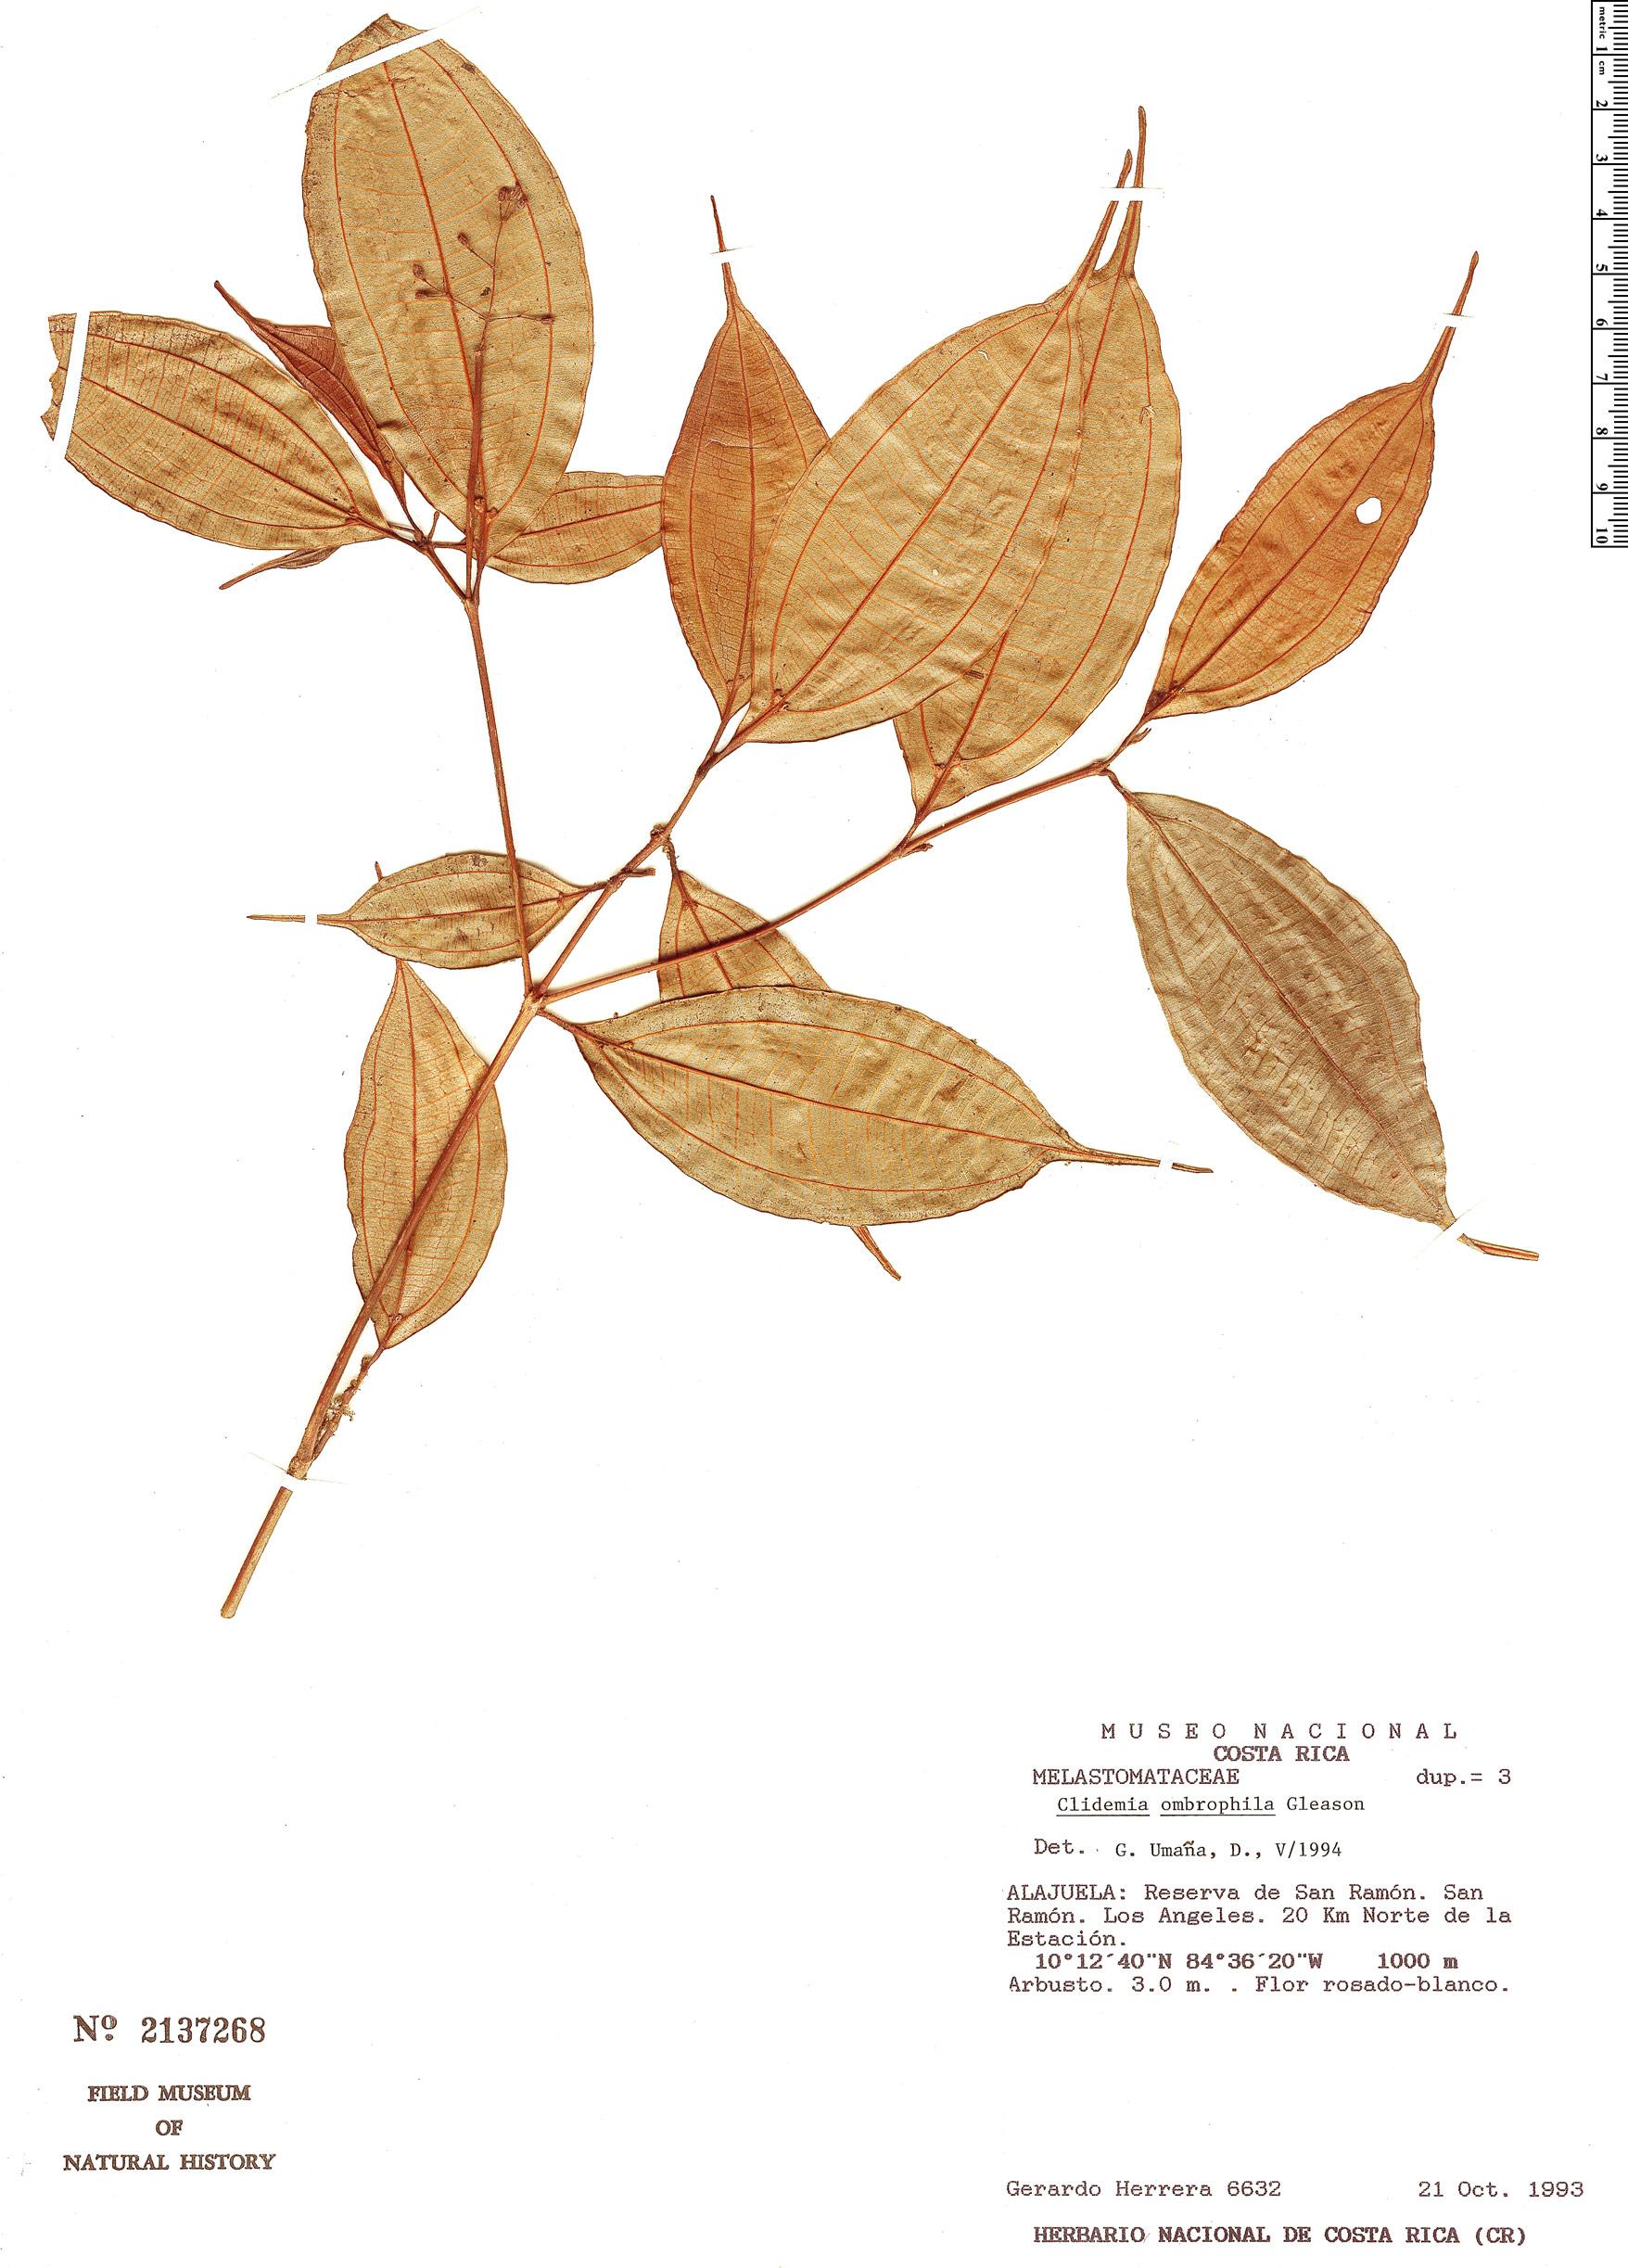 Specimen: Clidemia ombrophila